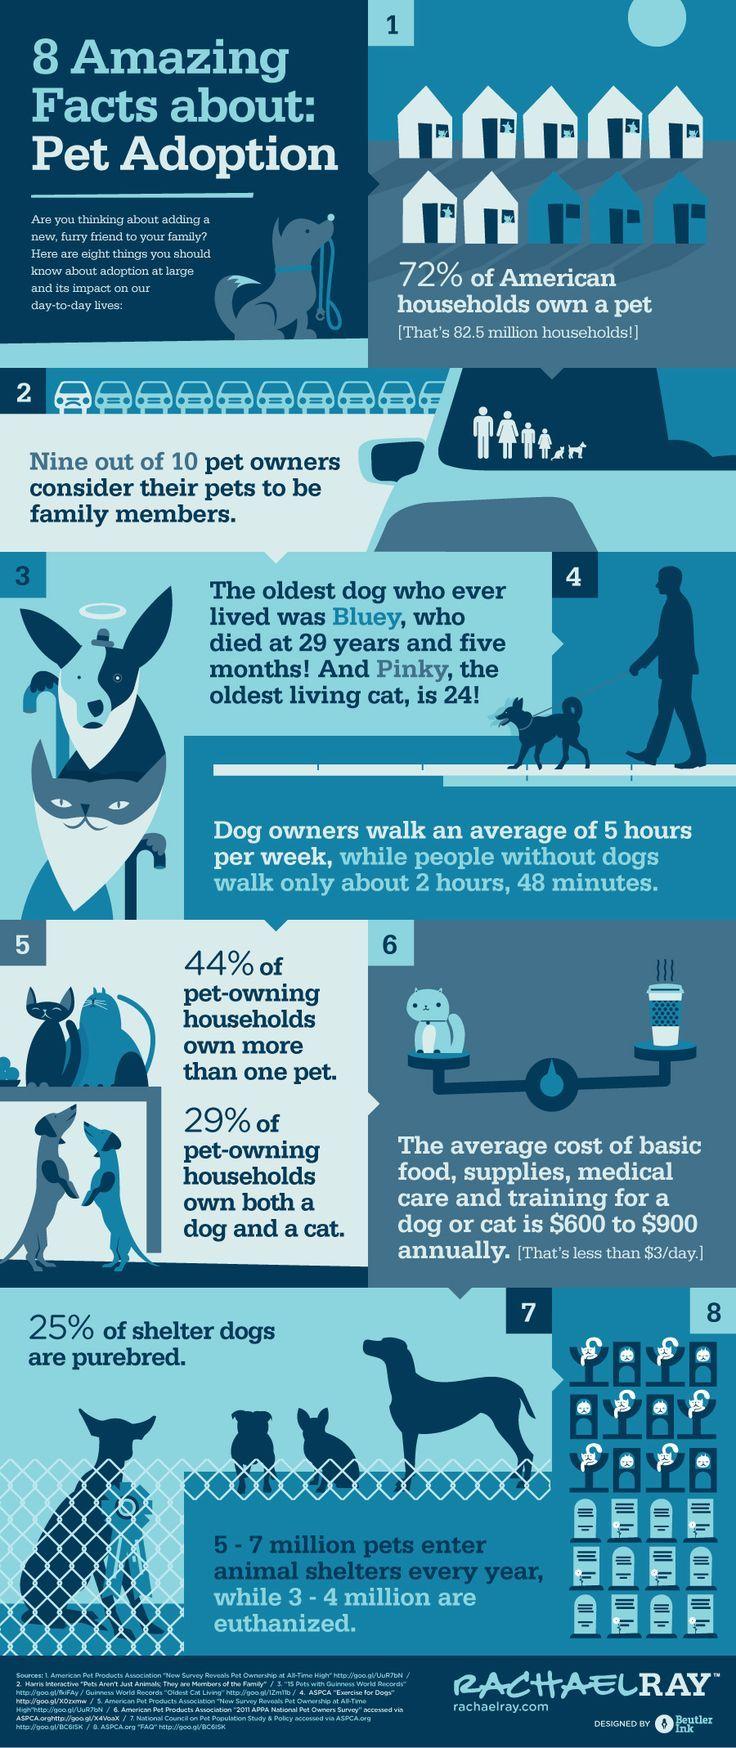 8 Amazing Facts About Pet Adoption